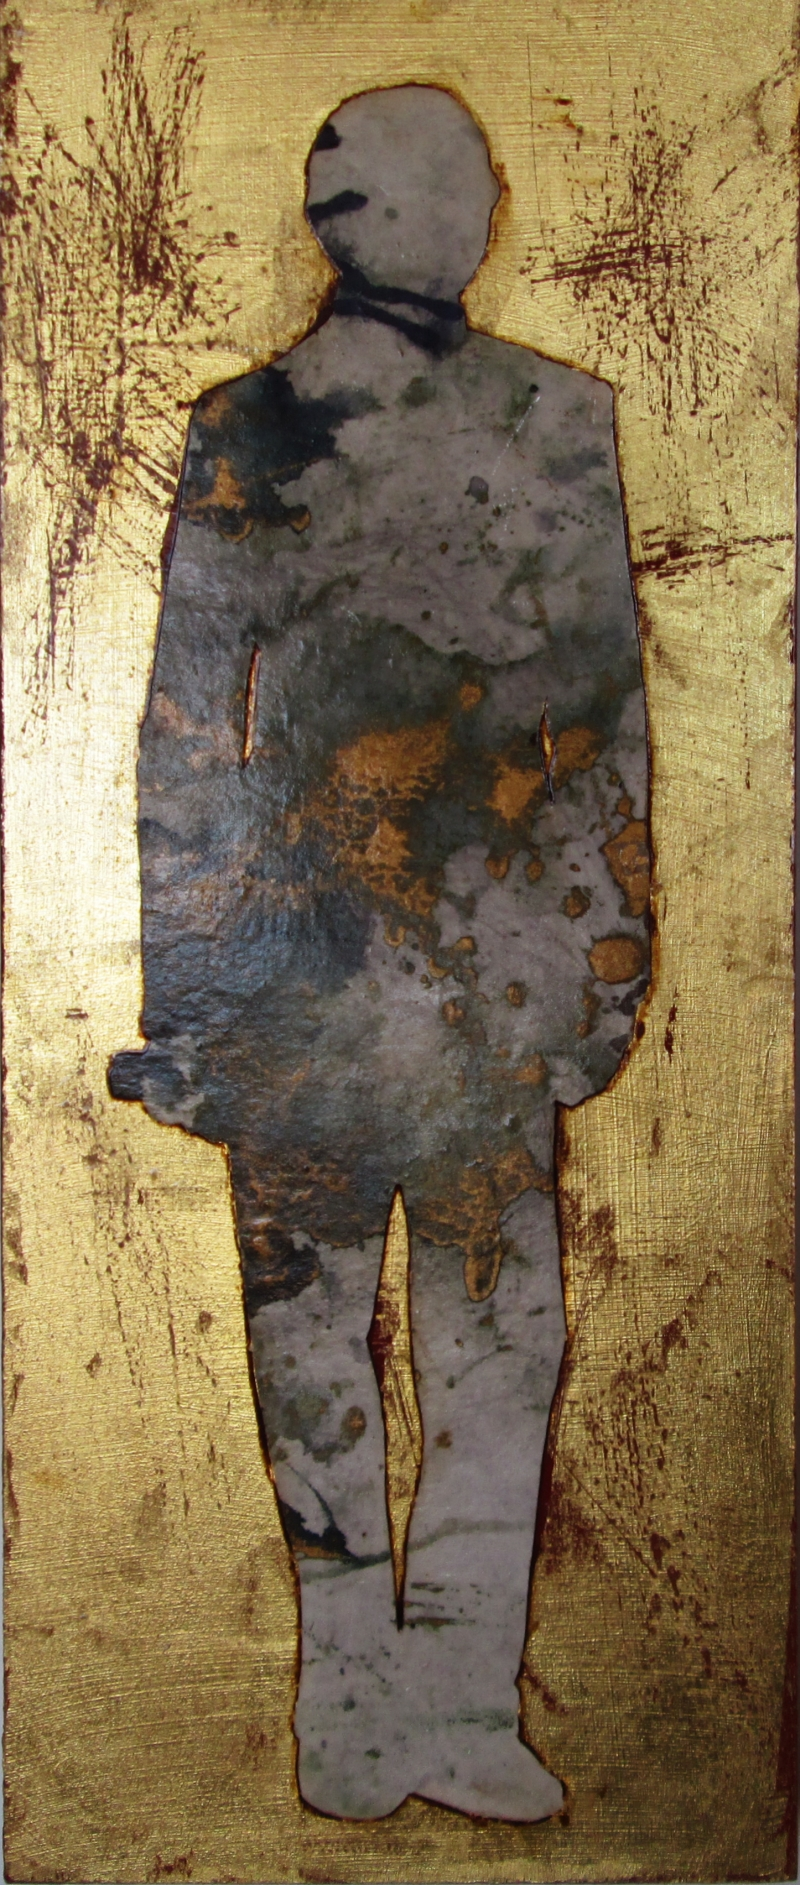 Afuwa - Familiar Icons - The Gentleman